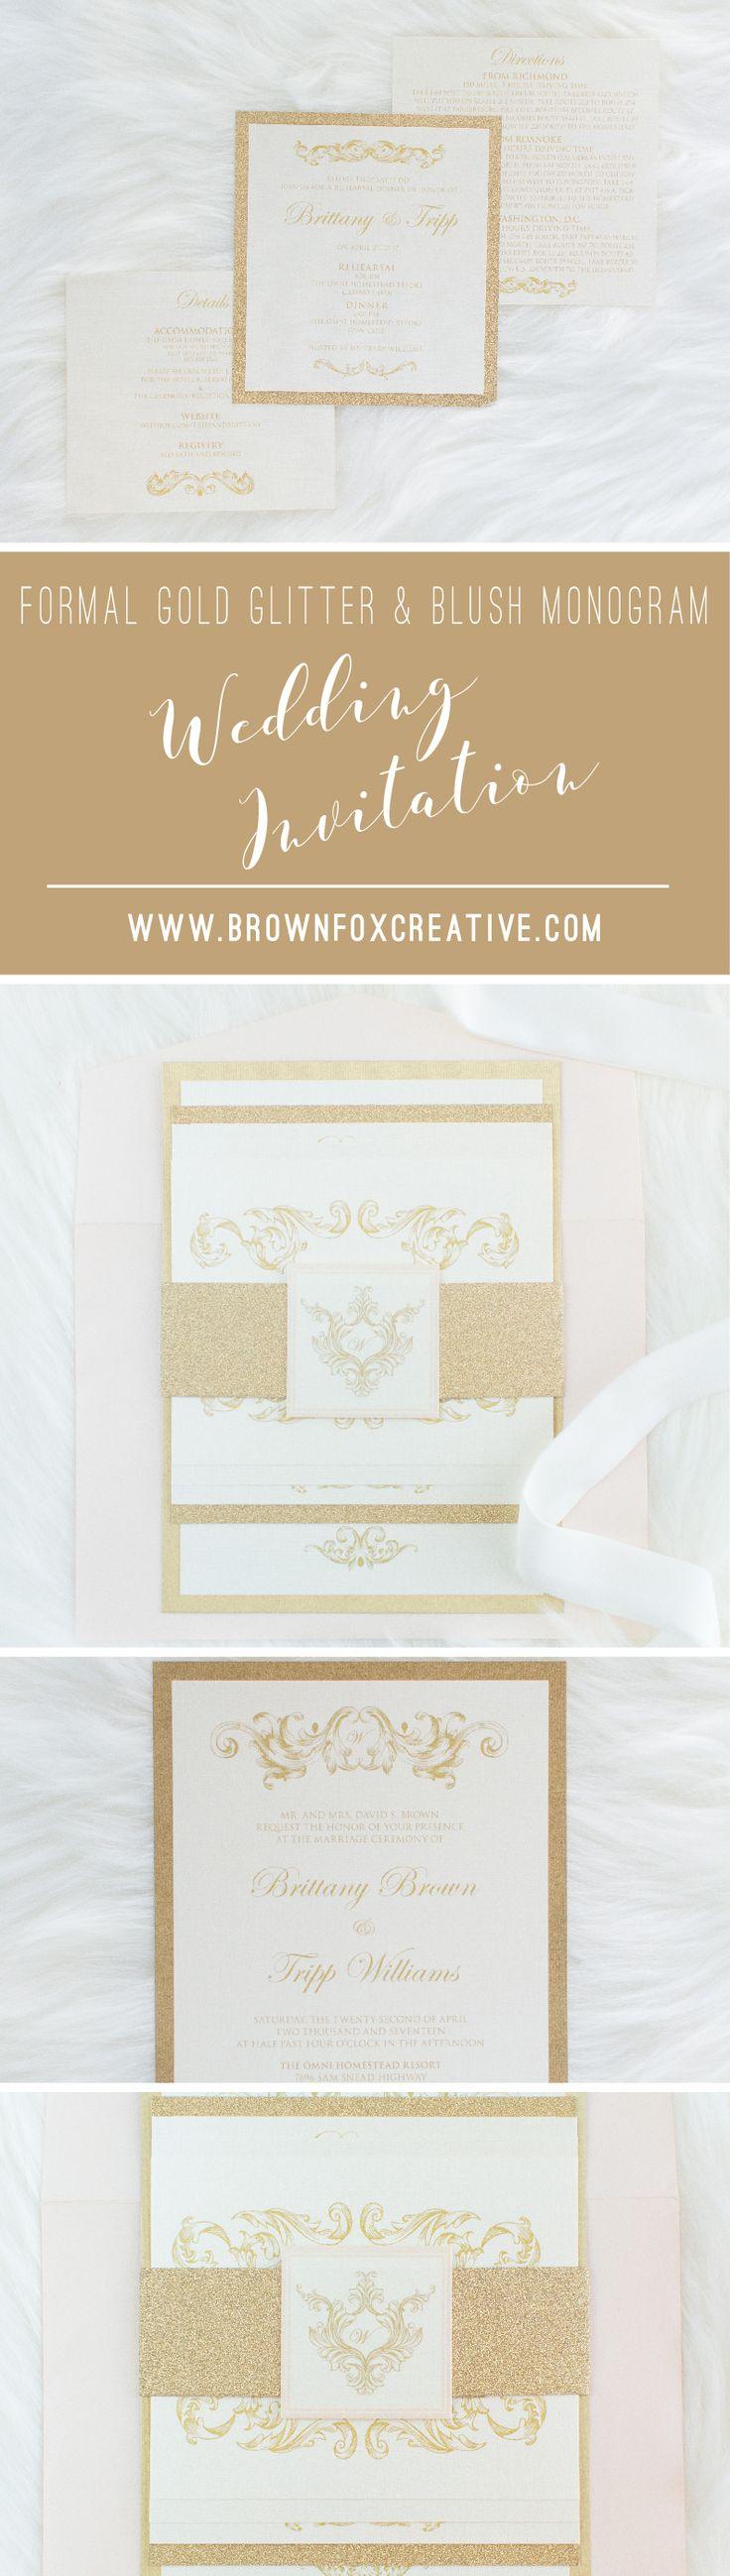 avery address labels wedding invitations%0A Traditional Formal Vintage Gold Glitter and Pink Blush Rose Wedding  Invitation with Enclosure Band  u     Return Address Printing